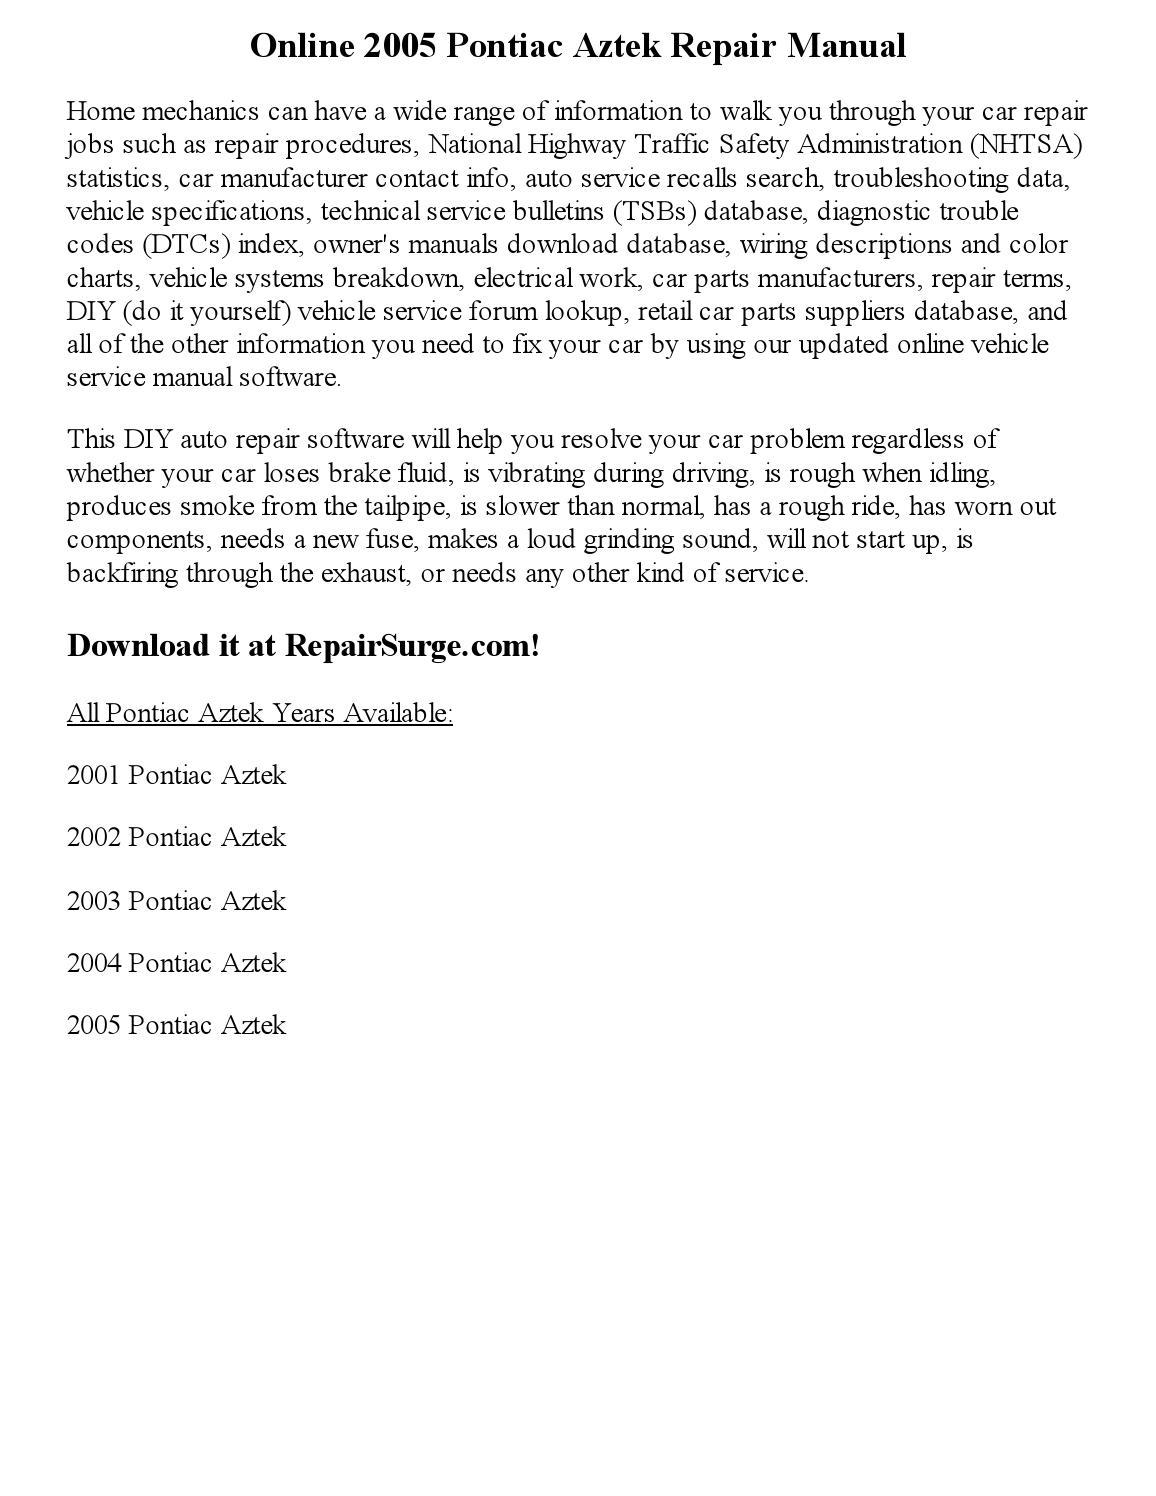 hight resolution of 2005 pontiac aztek repair manual online